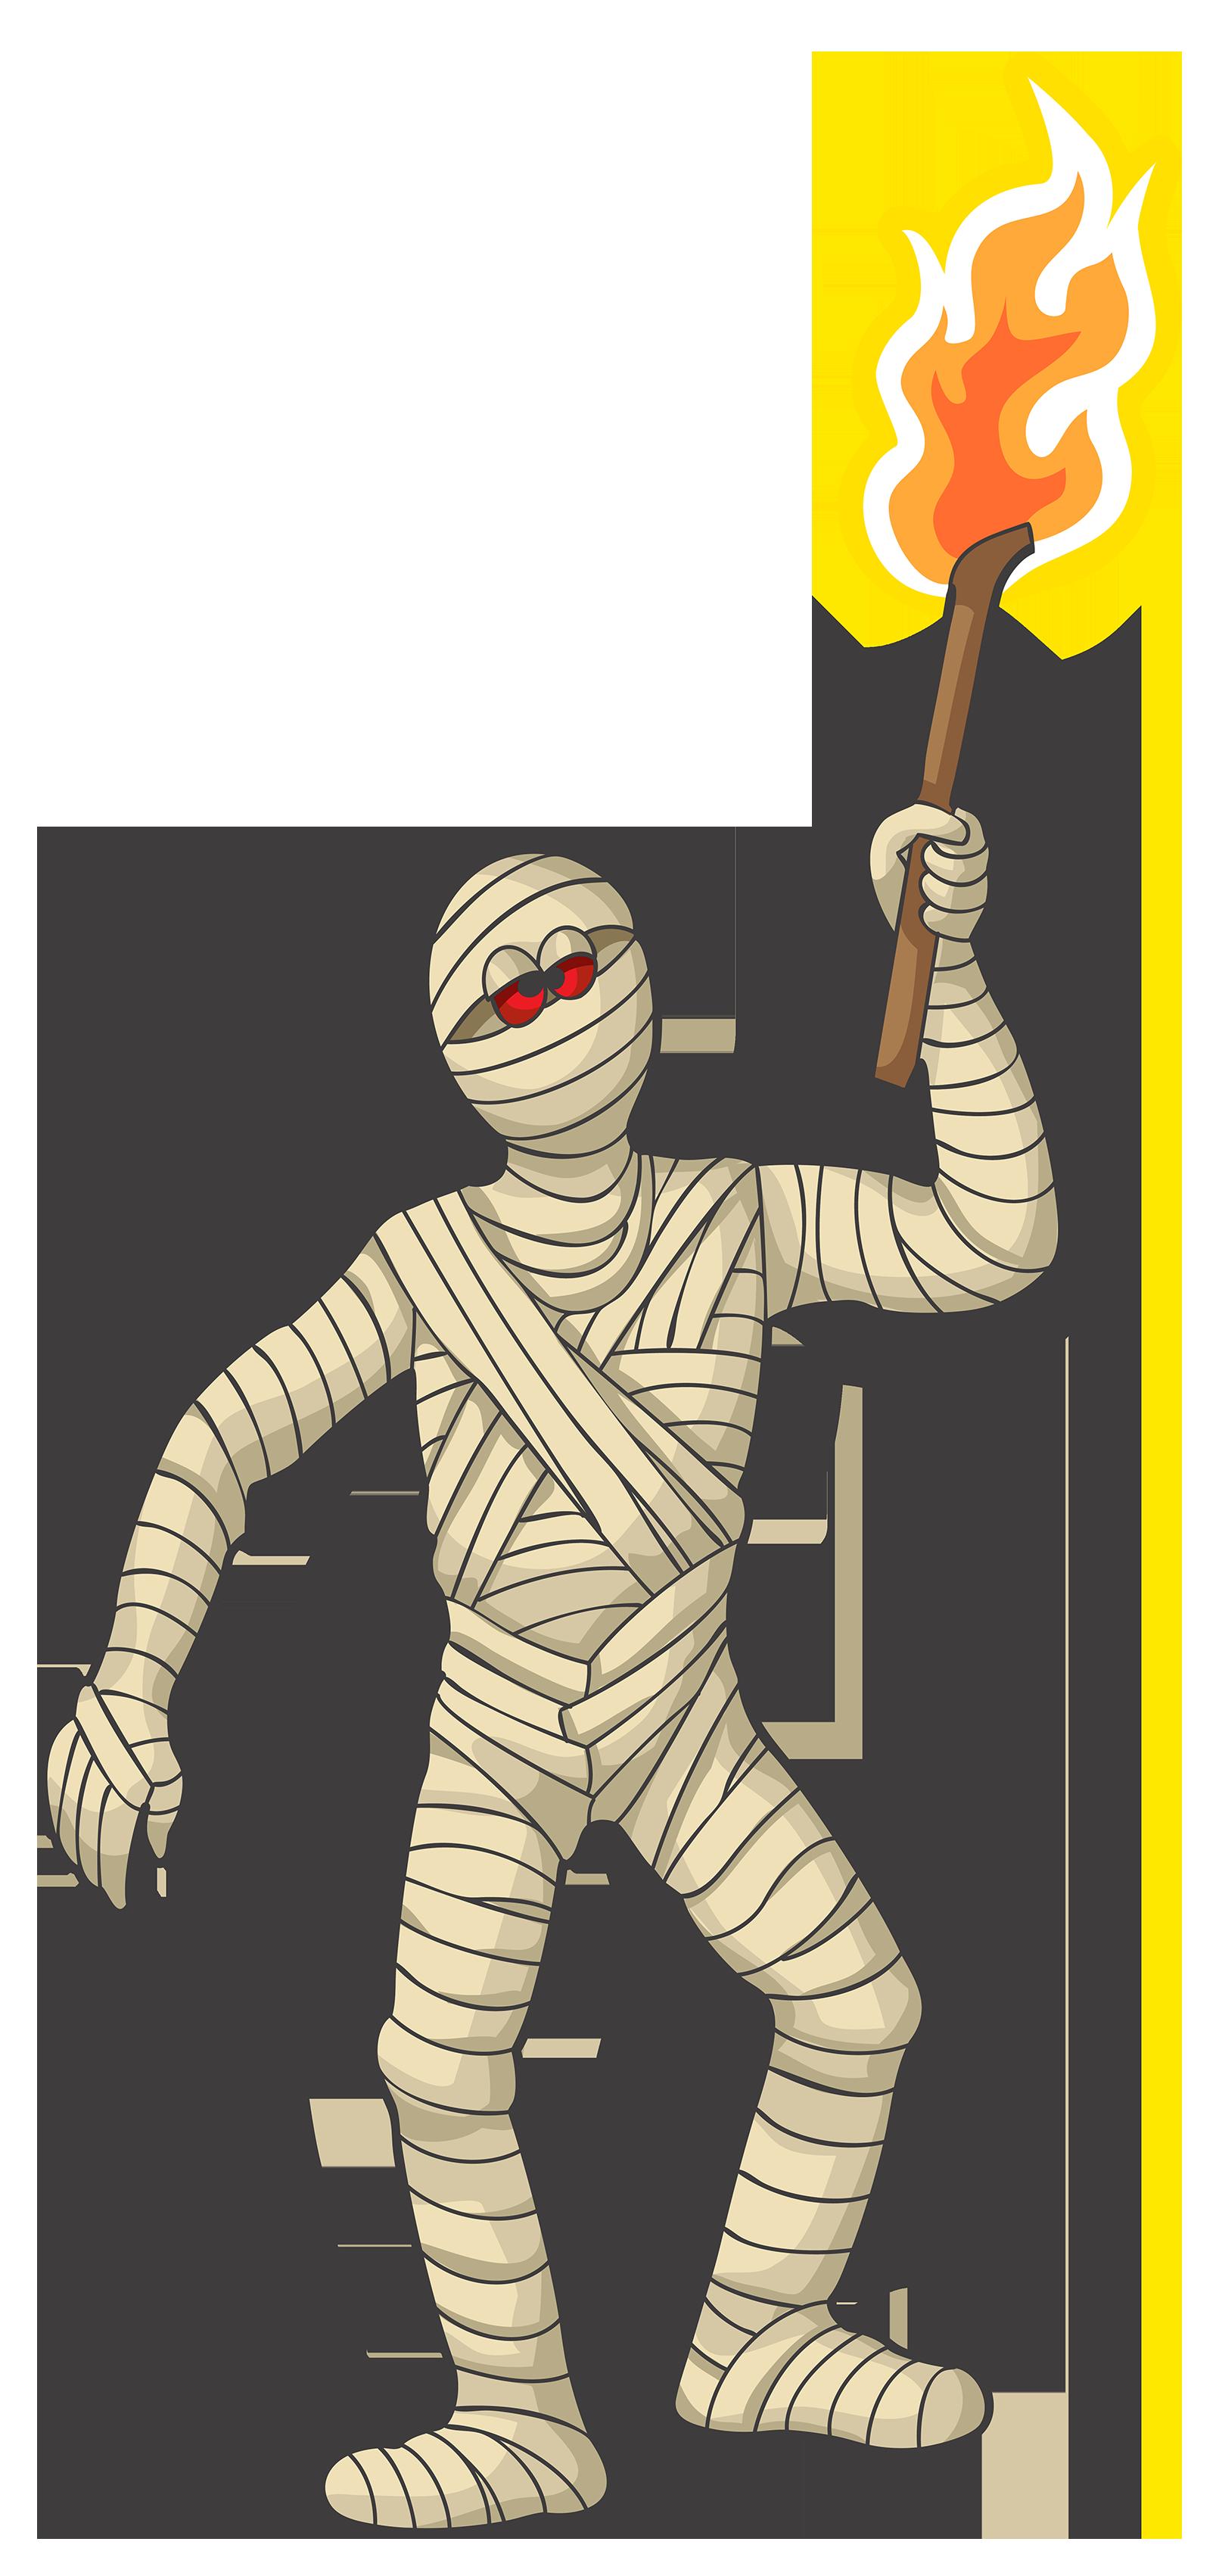 Halloween clipart mummy image royalty free download Halloween Mummy PNG Clipart Image | Gallery Yopriceville - High ... image royalty free download